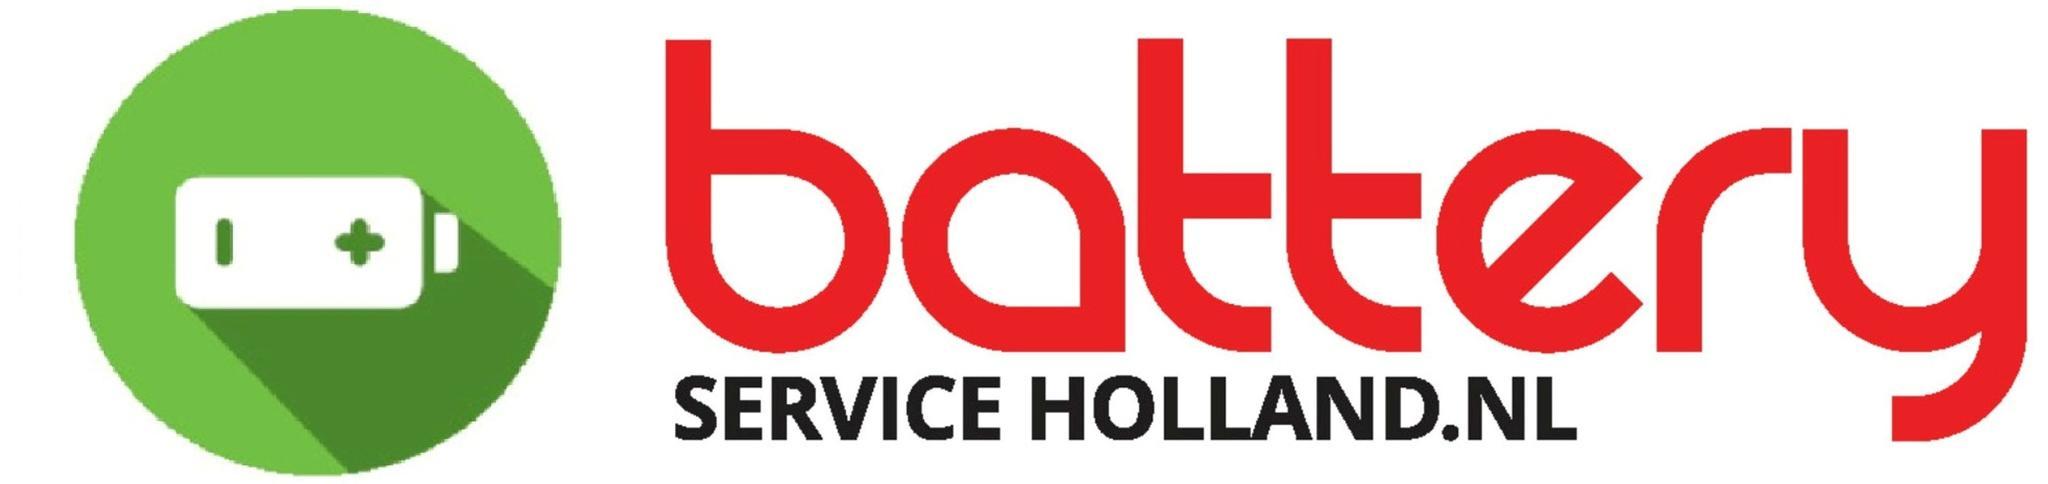 Batterij Service Holland